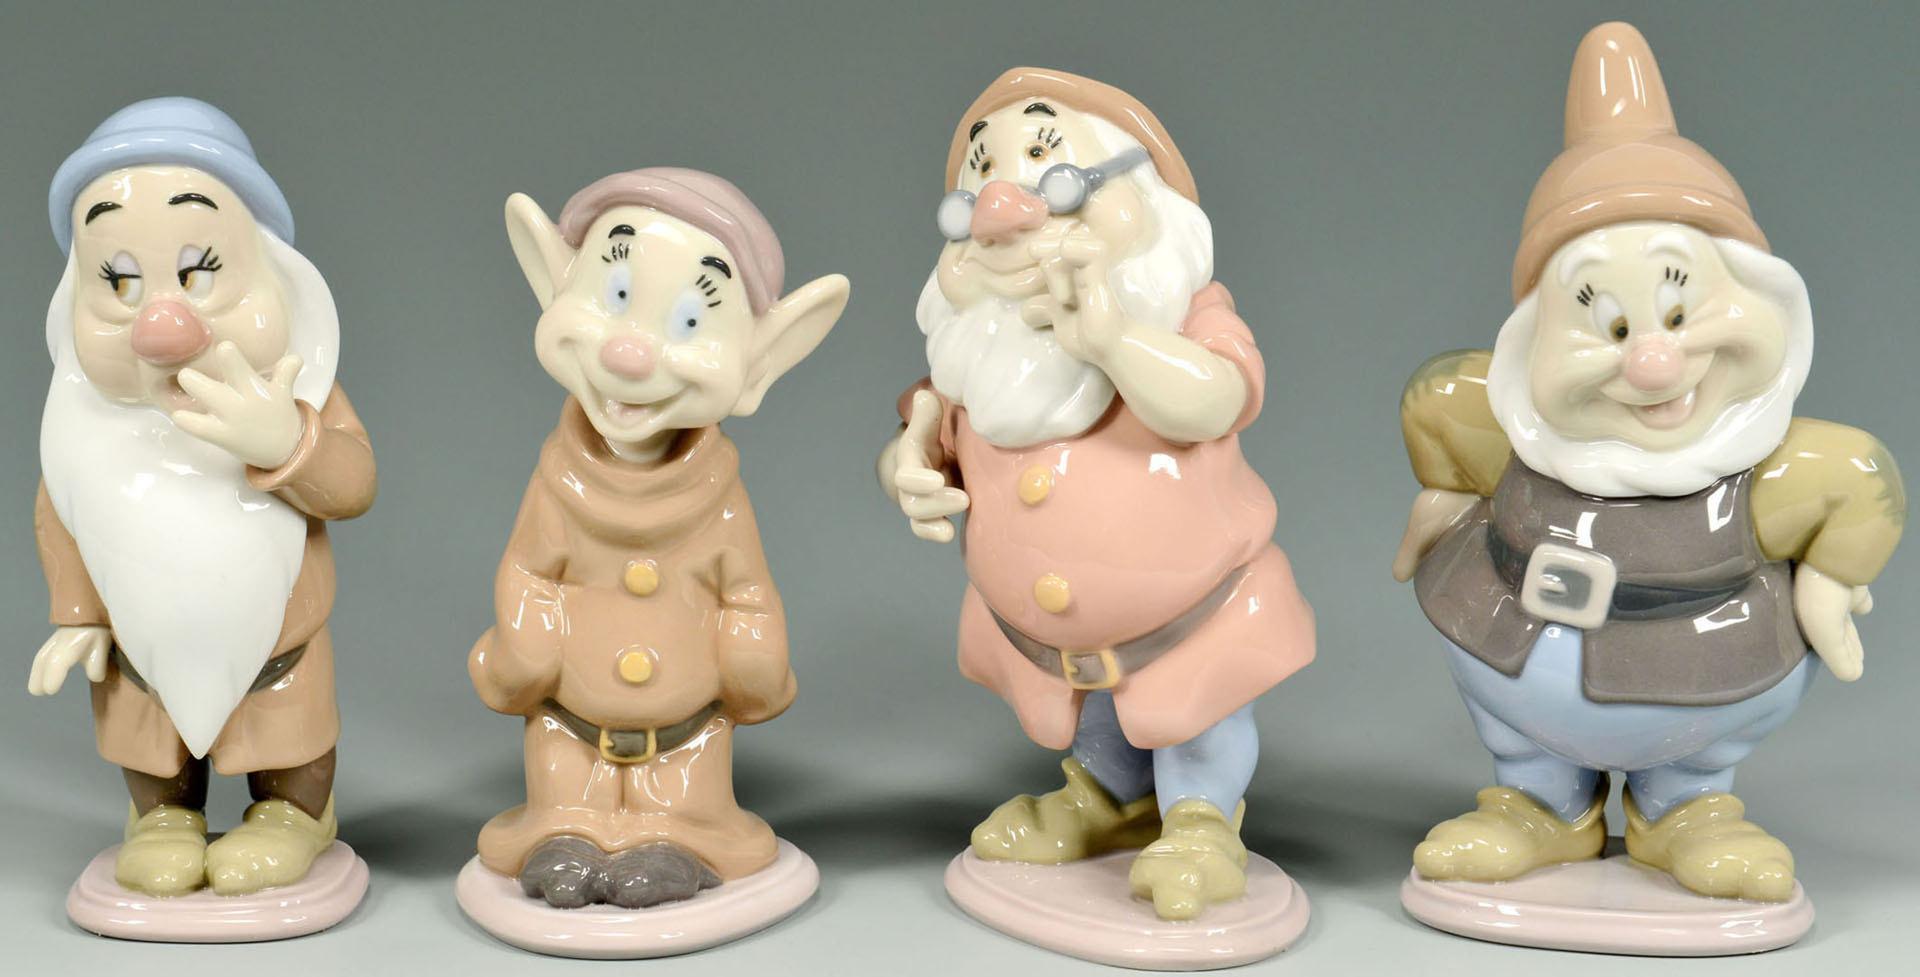 Lot 657: Lladro Disney Snow White and Seven Dwarfs